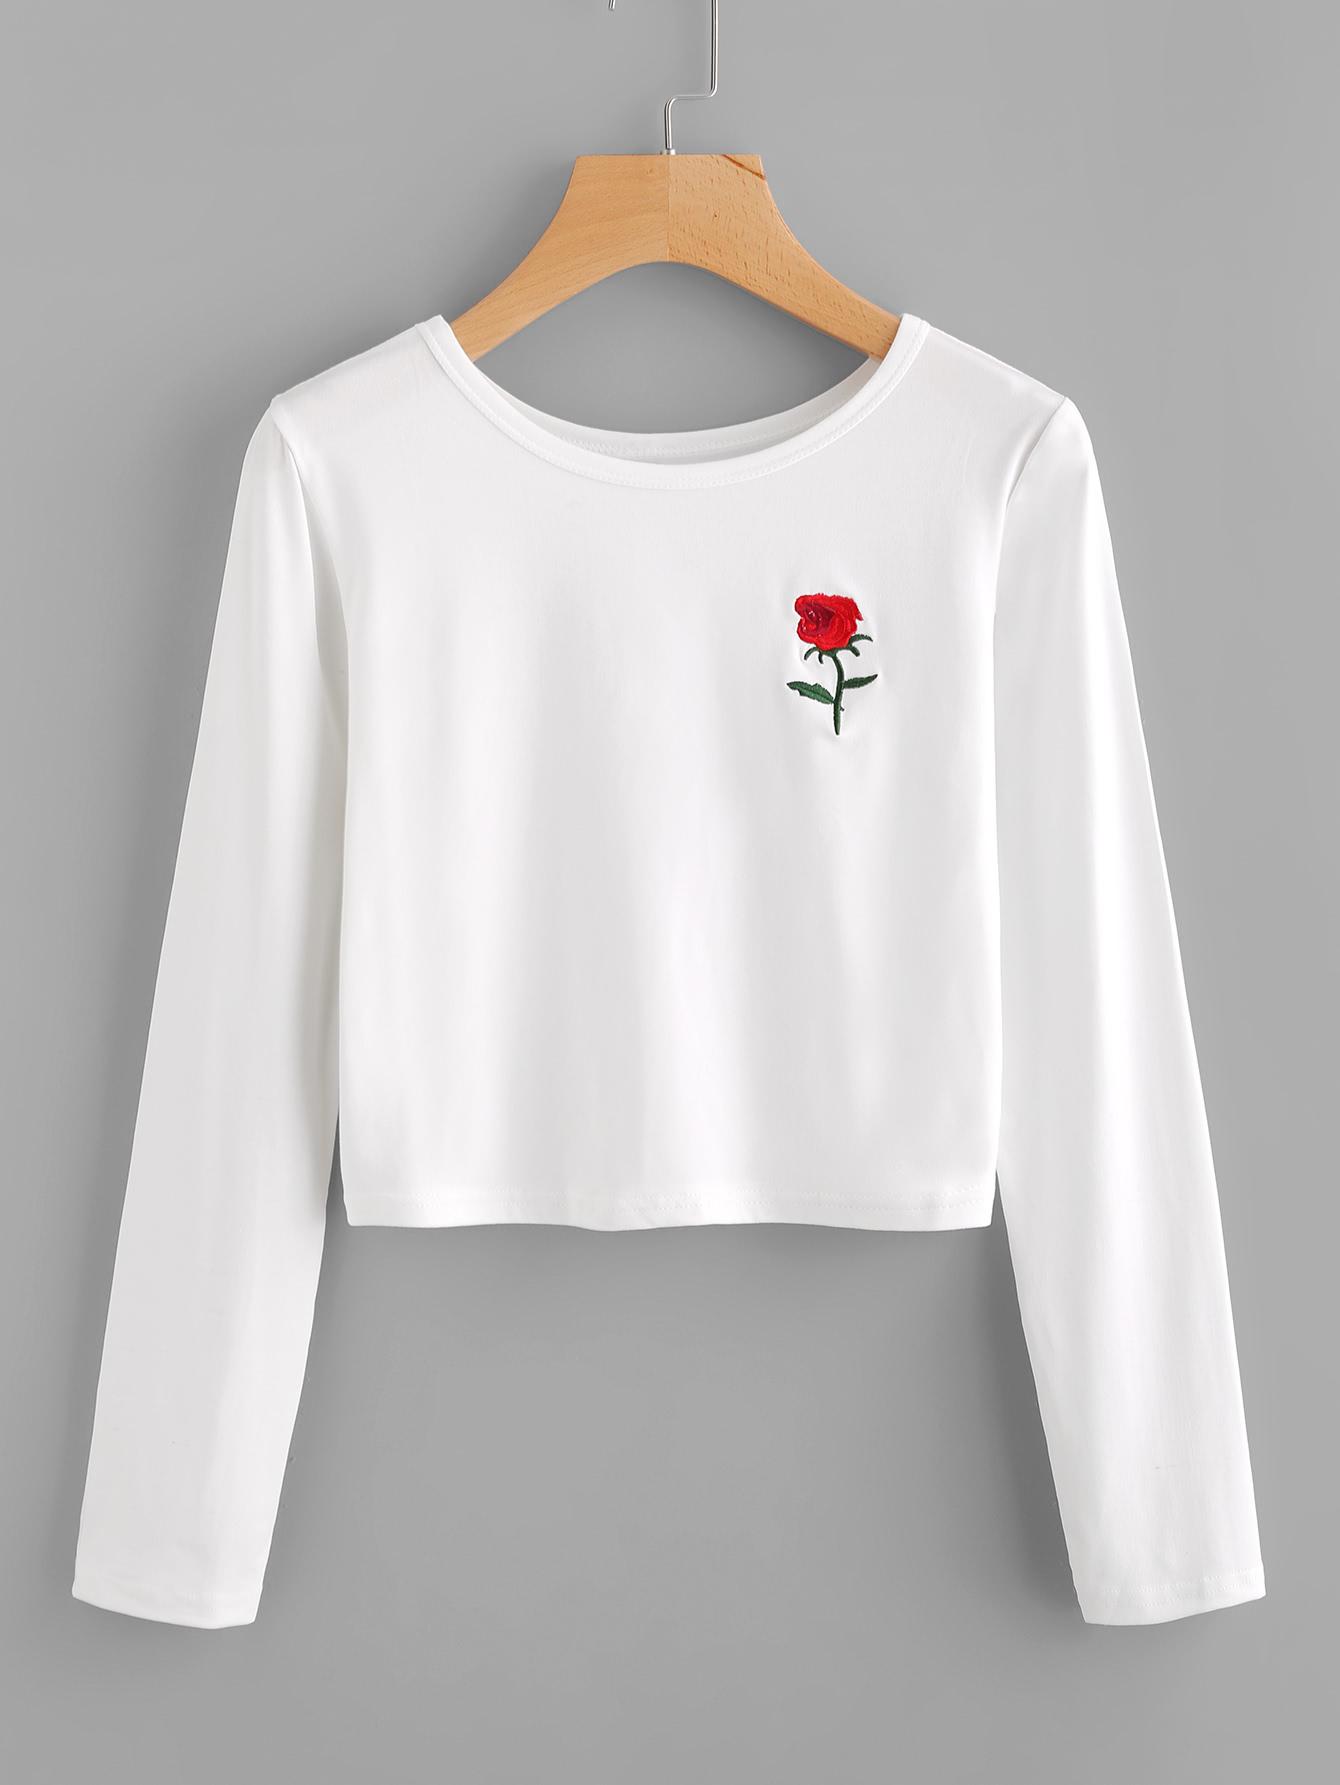 Rose embroidered crop tee shein sheinside